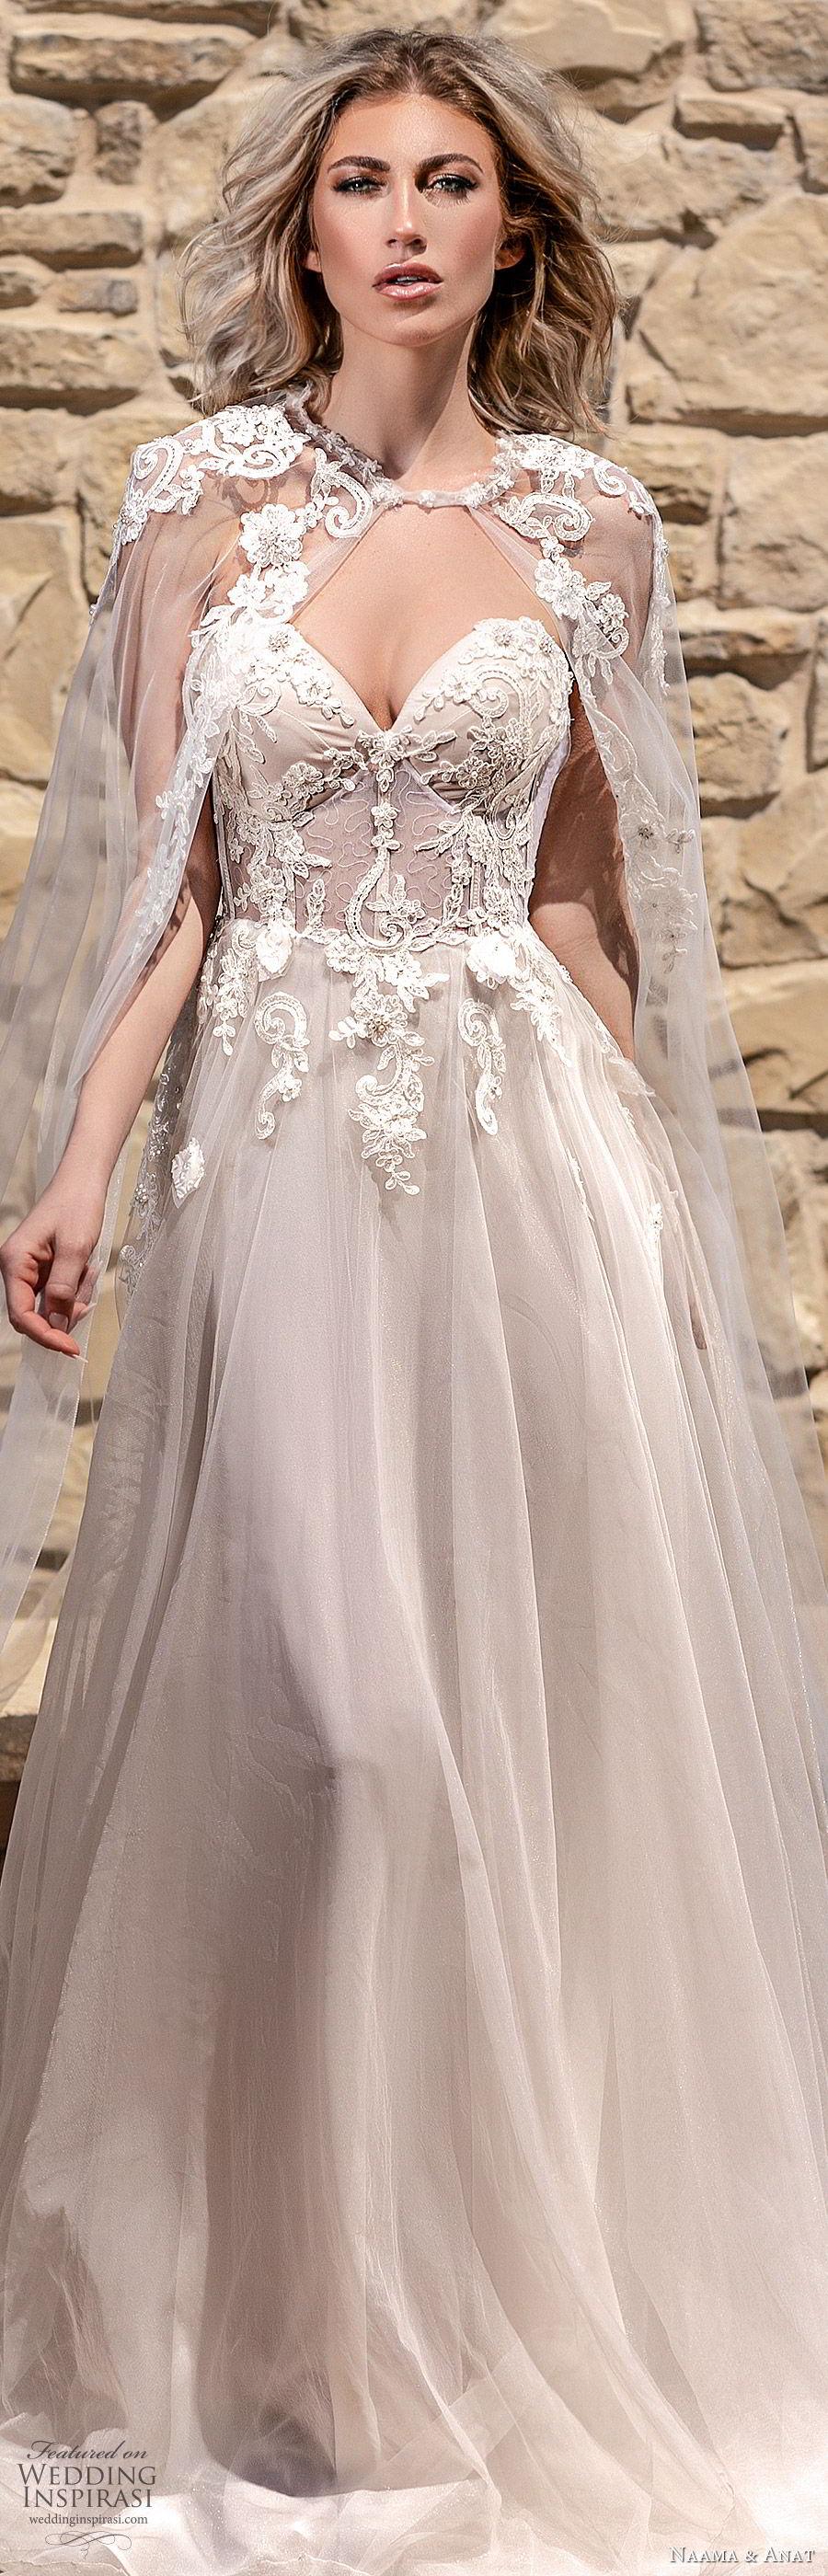 naama anat spring 2020 bridal off shoulder straps sweetheart neckline embellished bodice a line ball gown wedding dress (6) sheer cape chapel train romantic blush lv